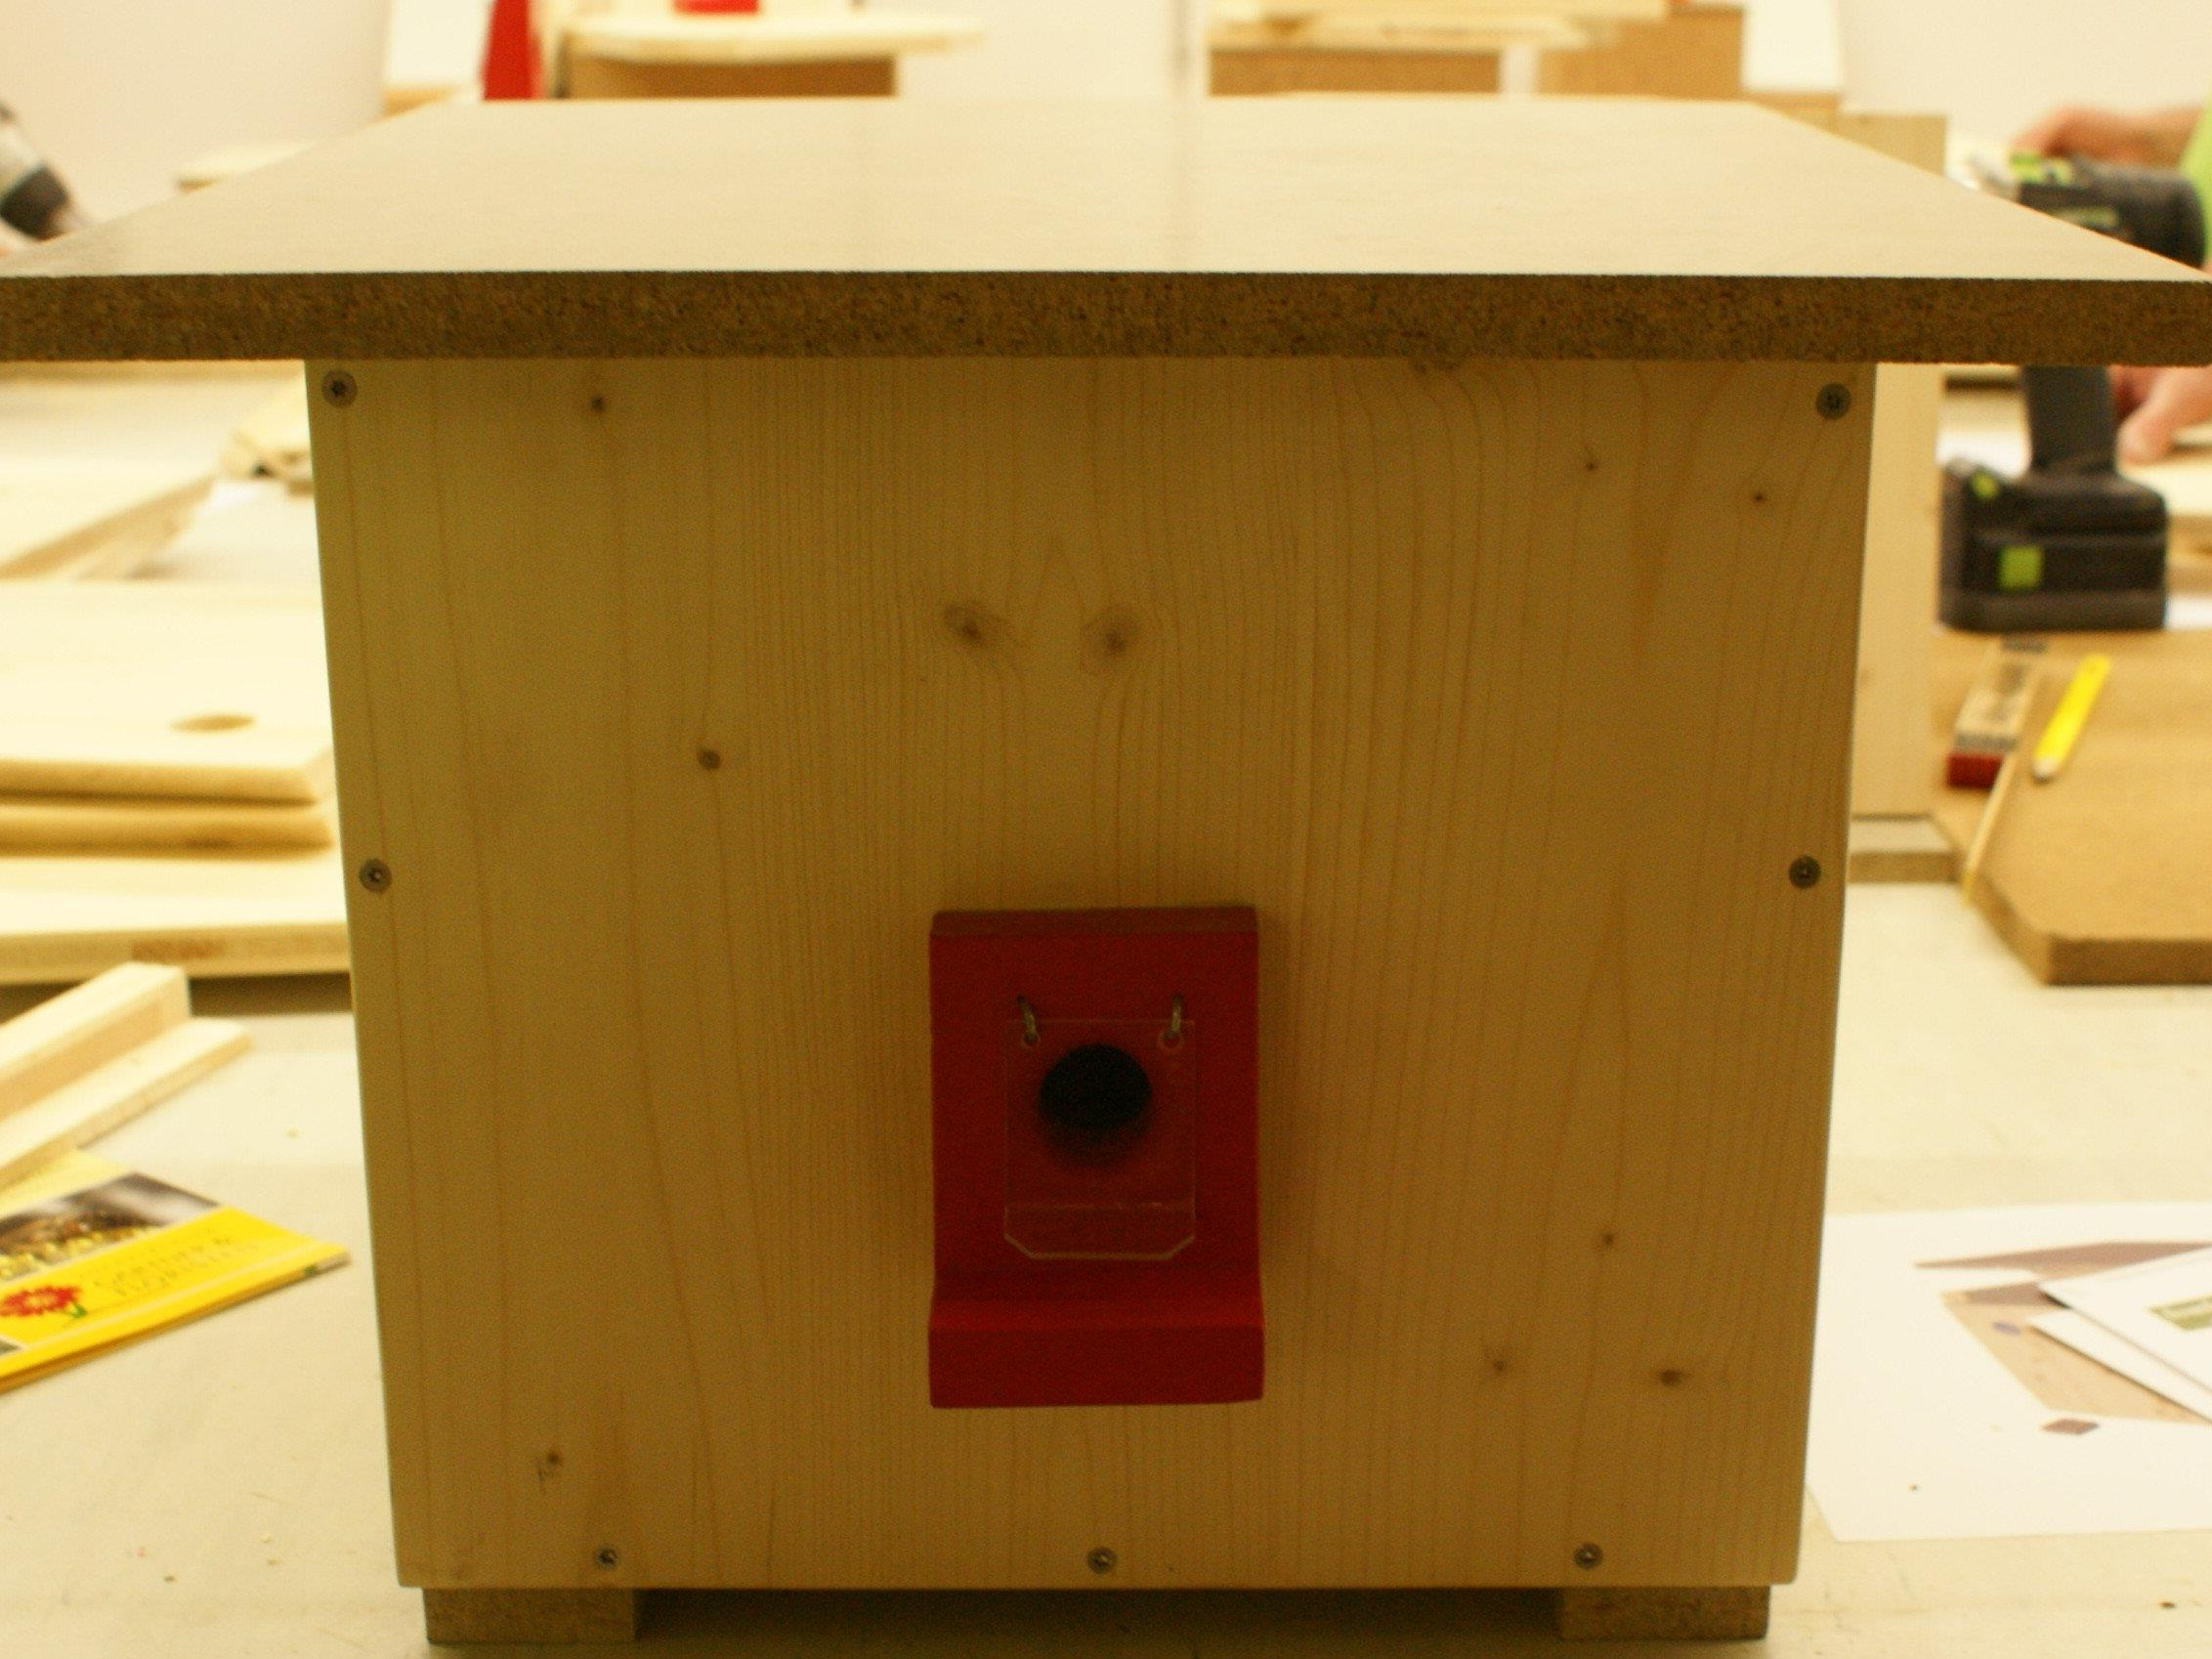 Ein Hummelhaus bauten fleißige Handwerker am 15. März im Krippenvereinslokal